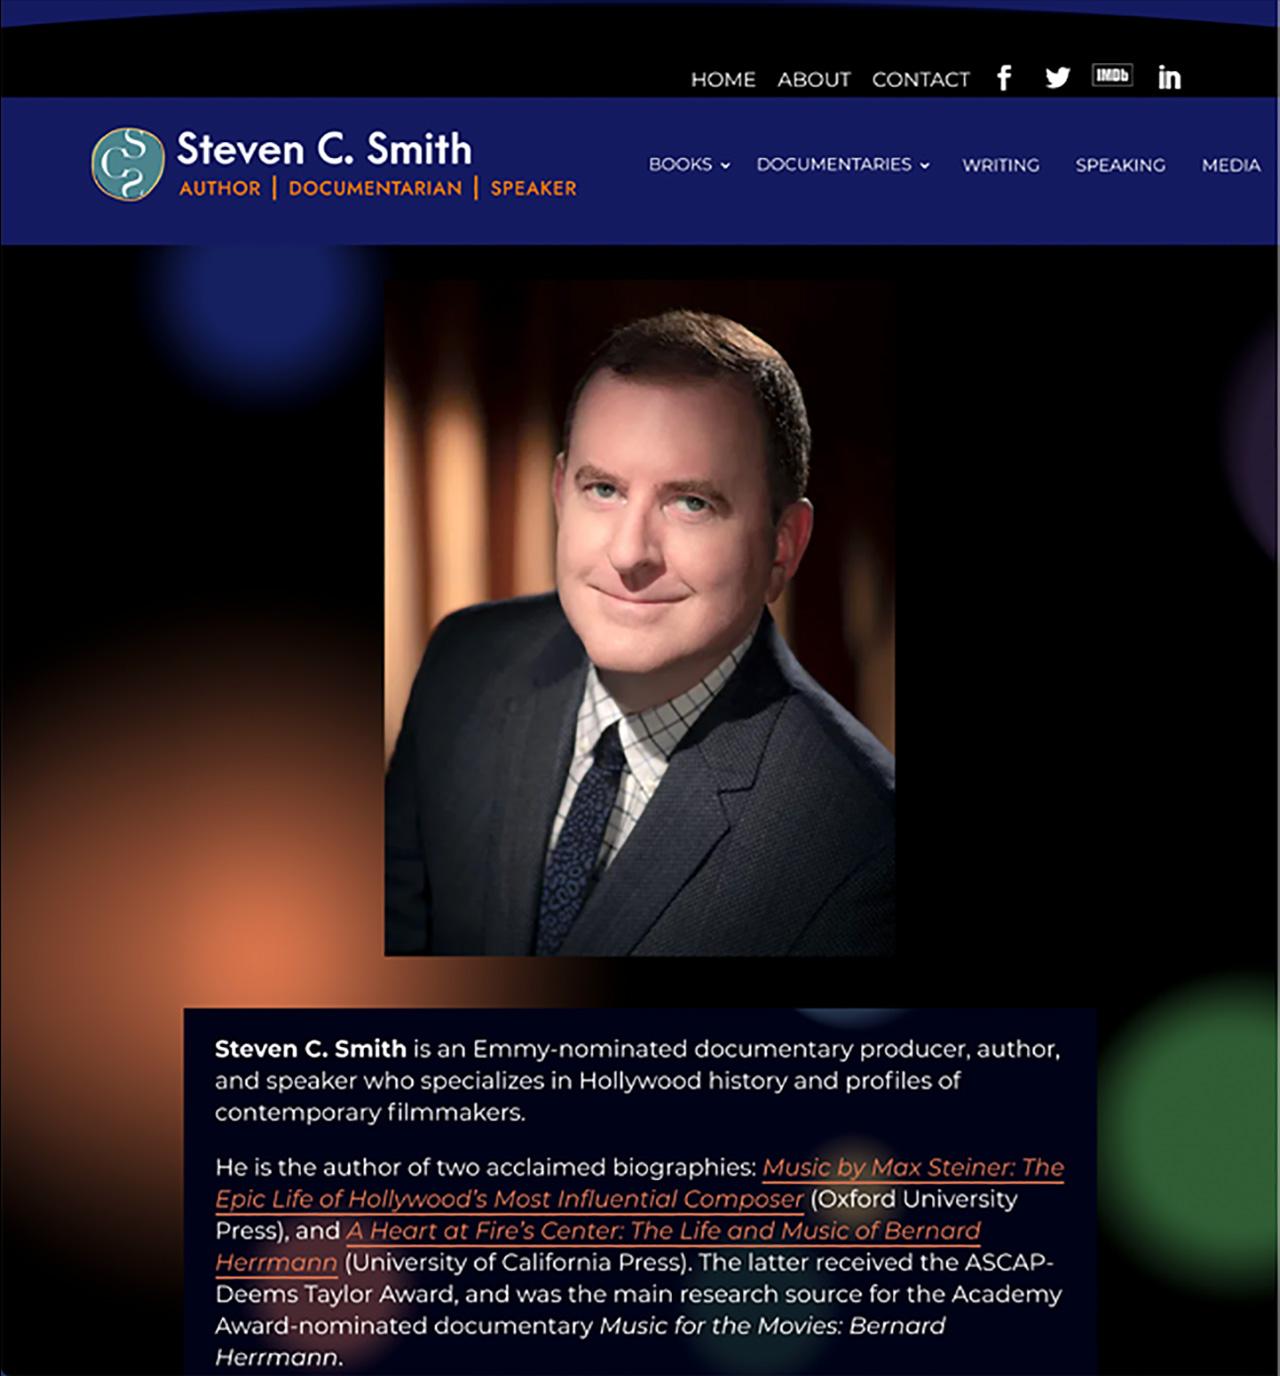 Steven C. Smith portrait photo on his website's homepage.